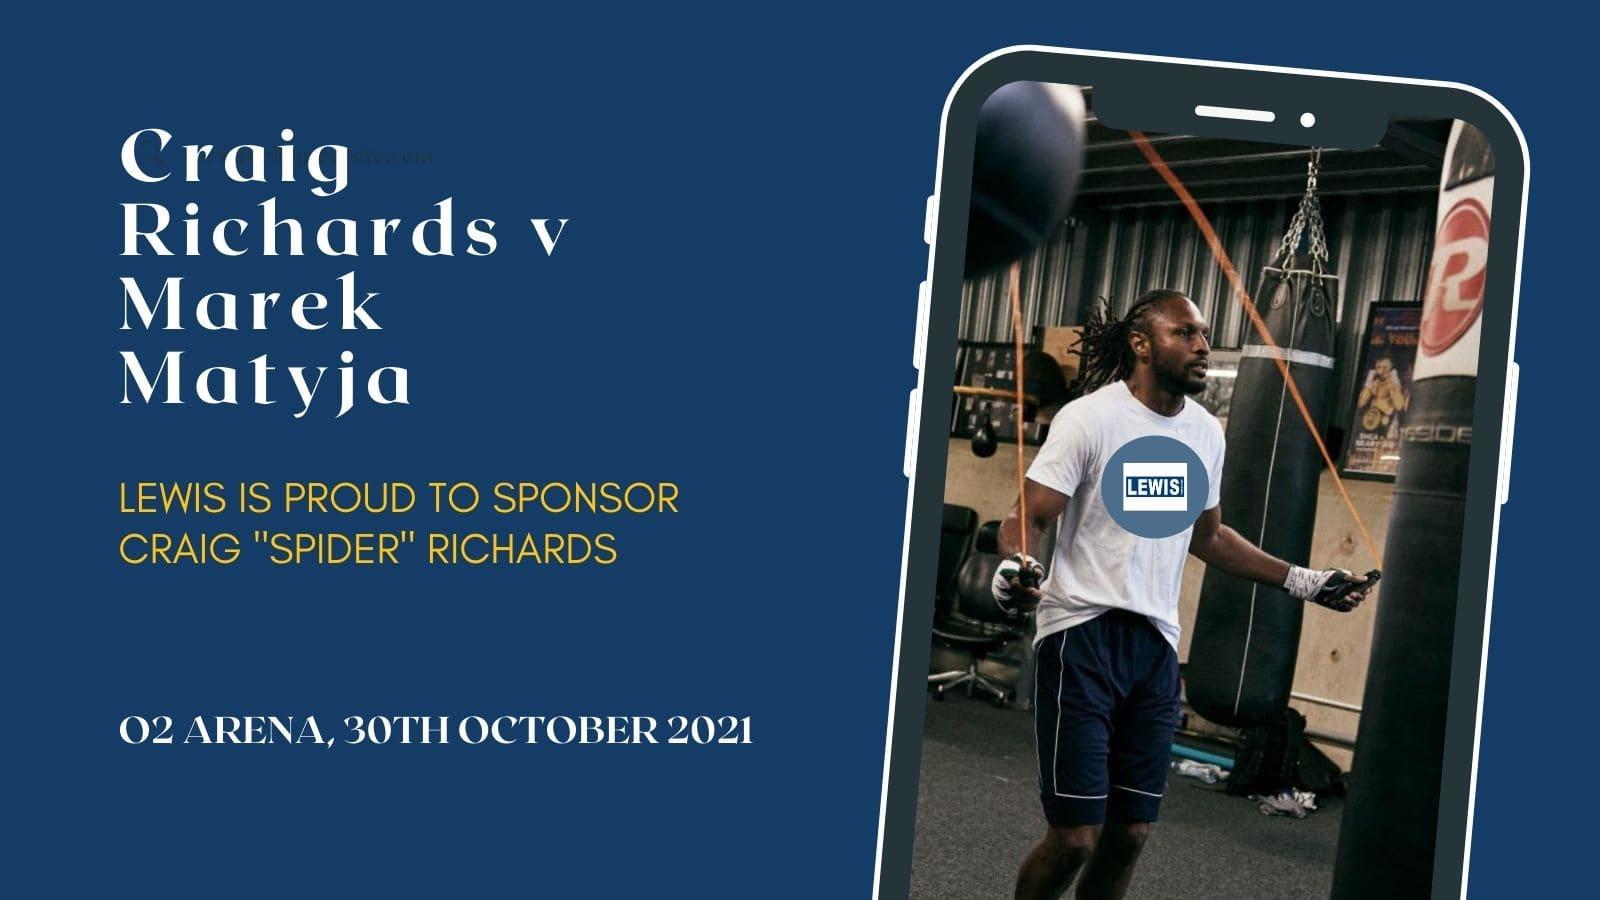 Craig Richards v Marek Matyja sponsored by Lewis Scaffold Towers-min